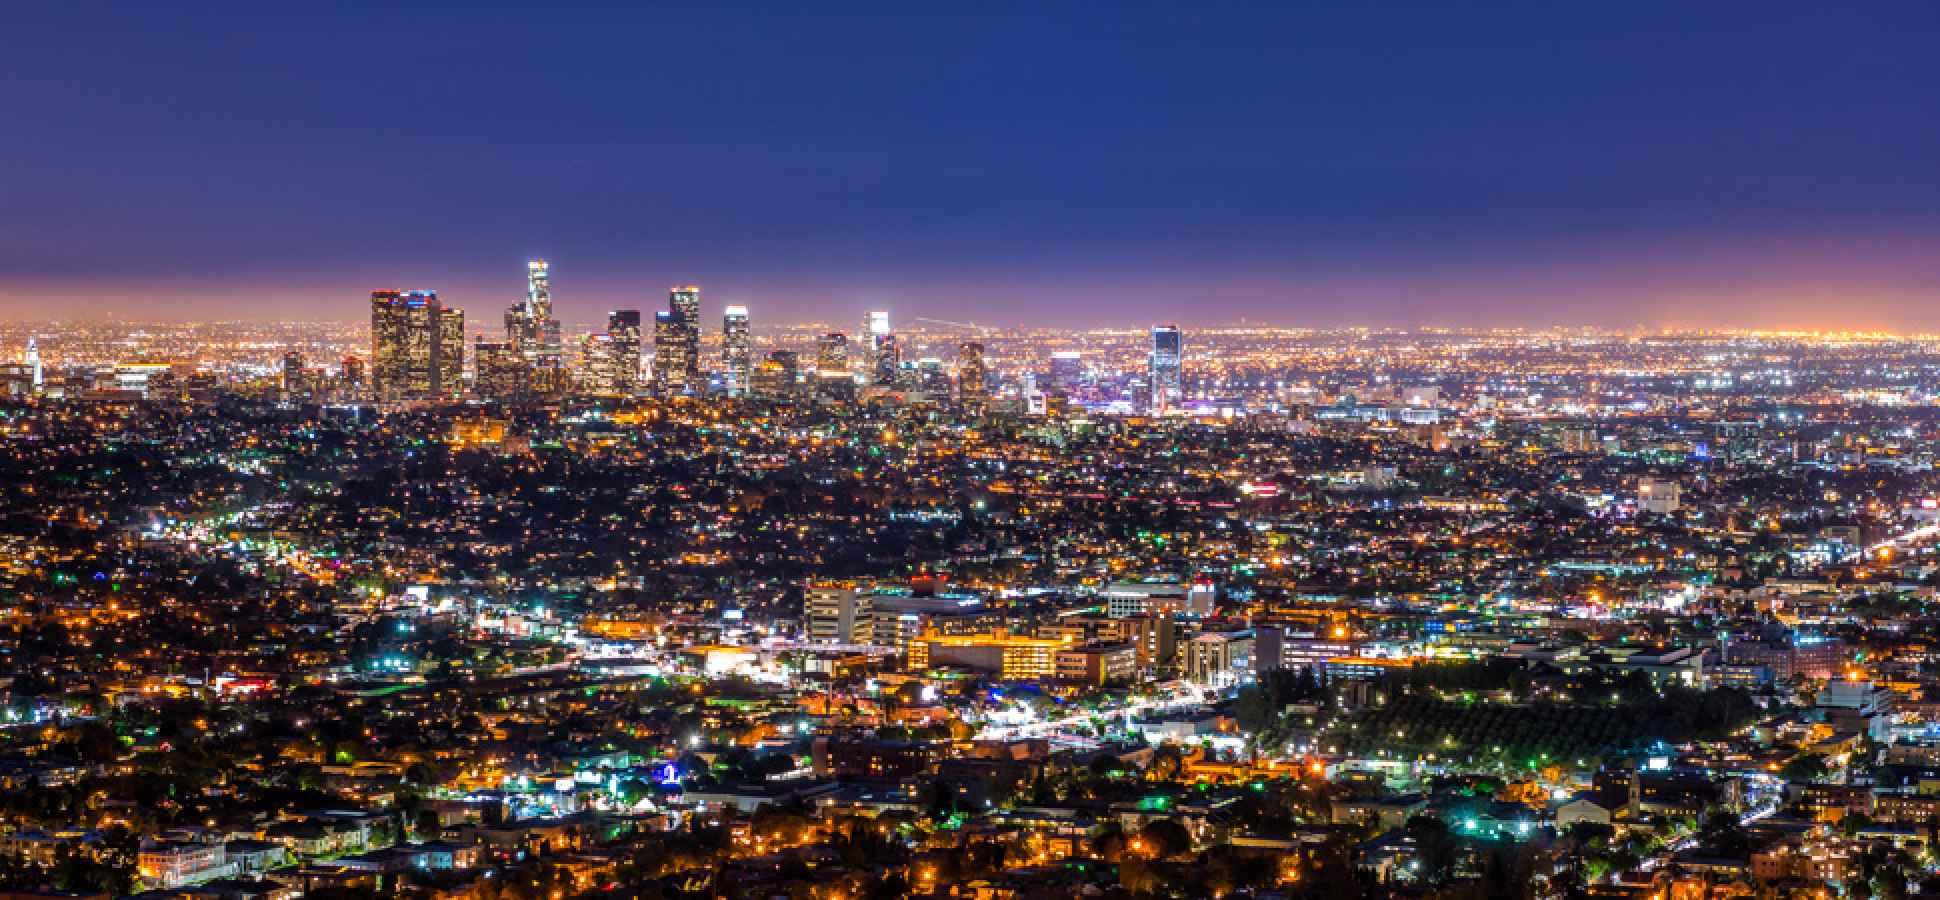 Silicon Beach' Brings Tech Boom to Los Angeles   Inc.com